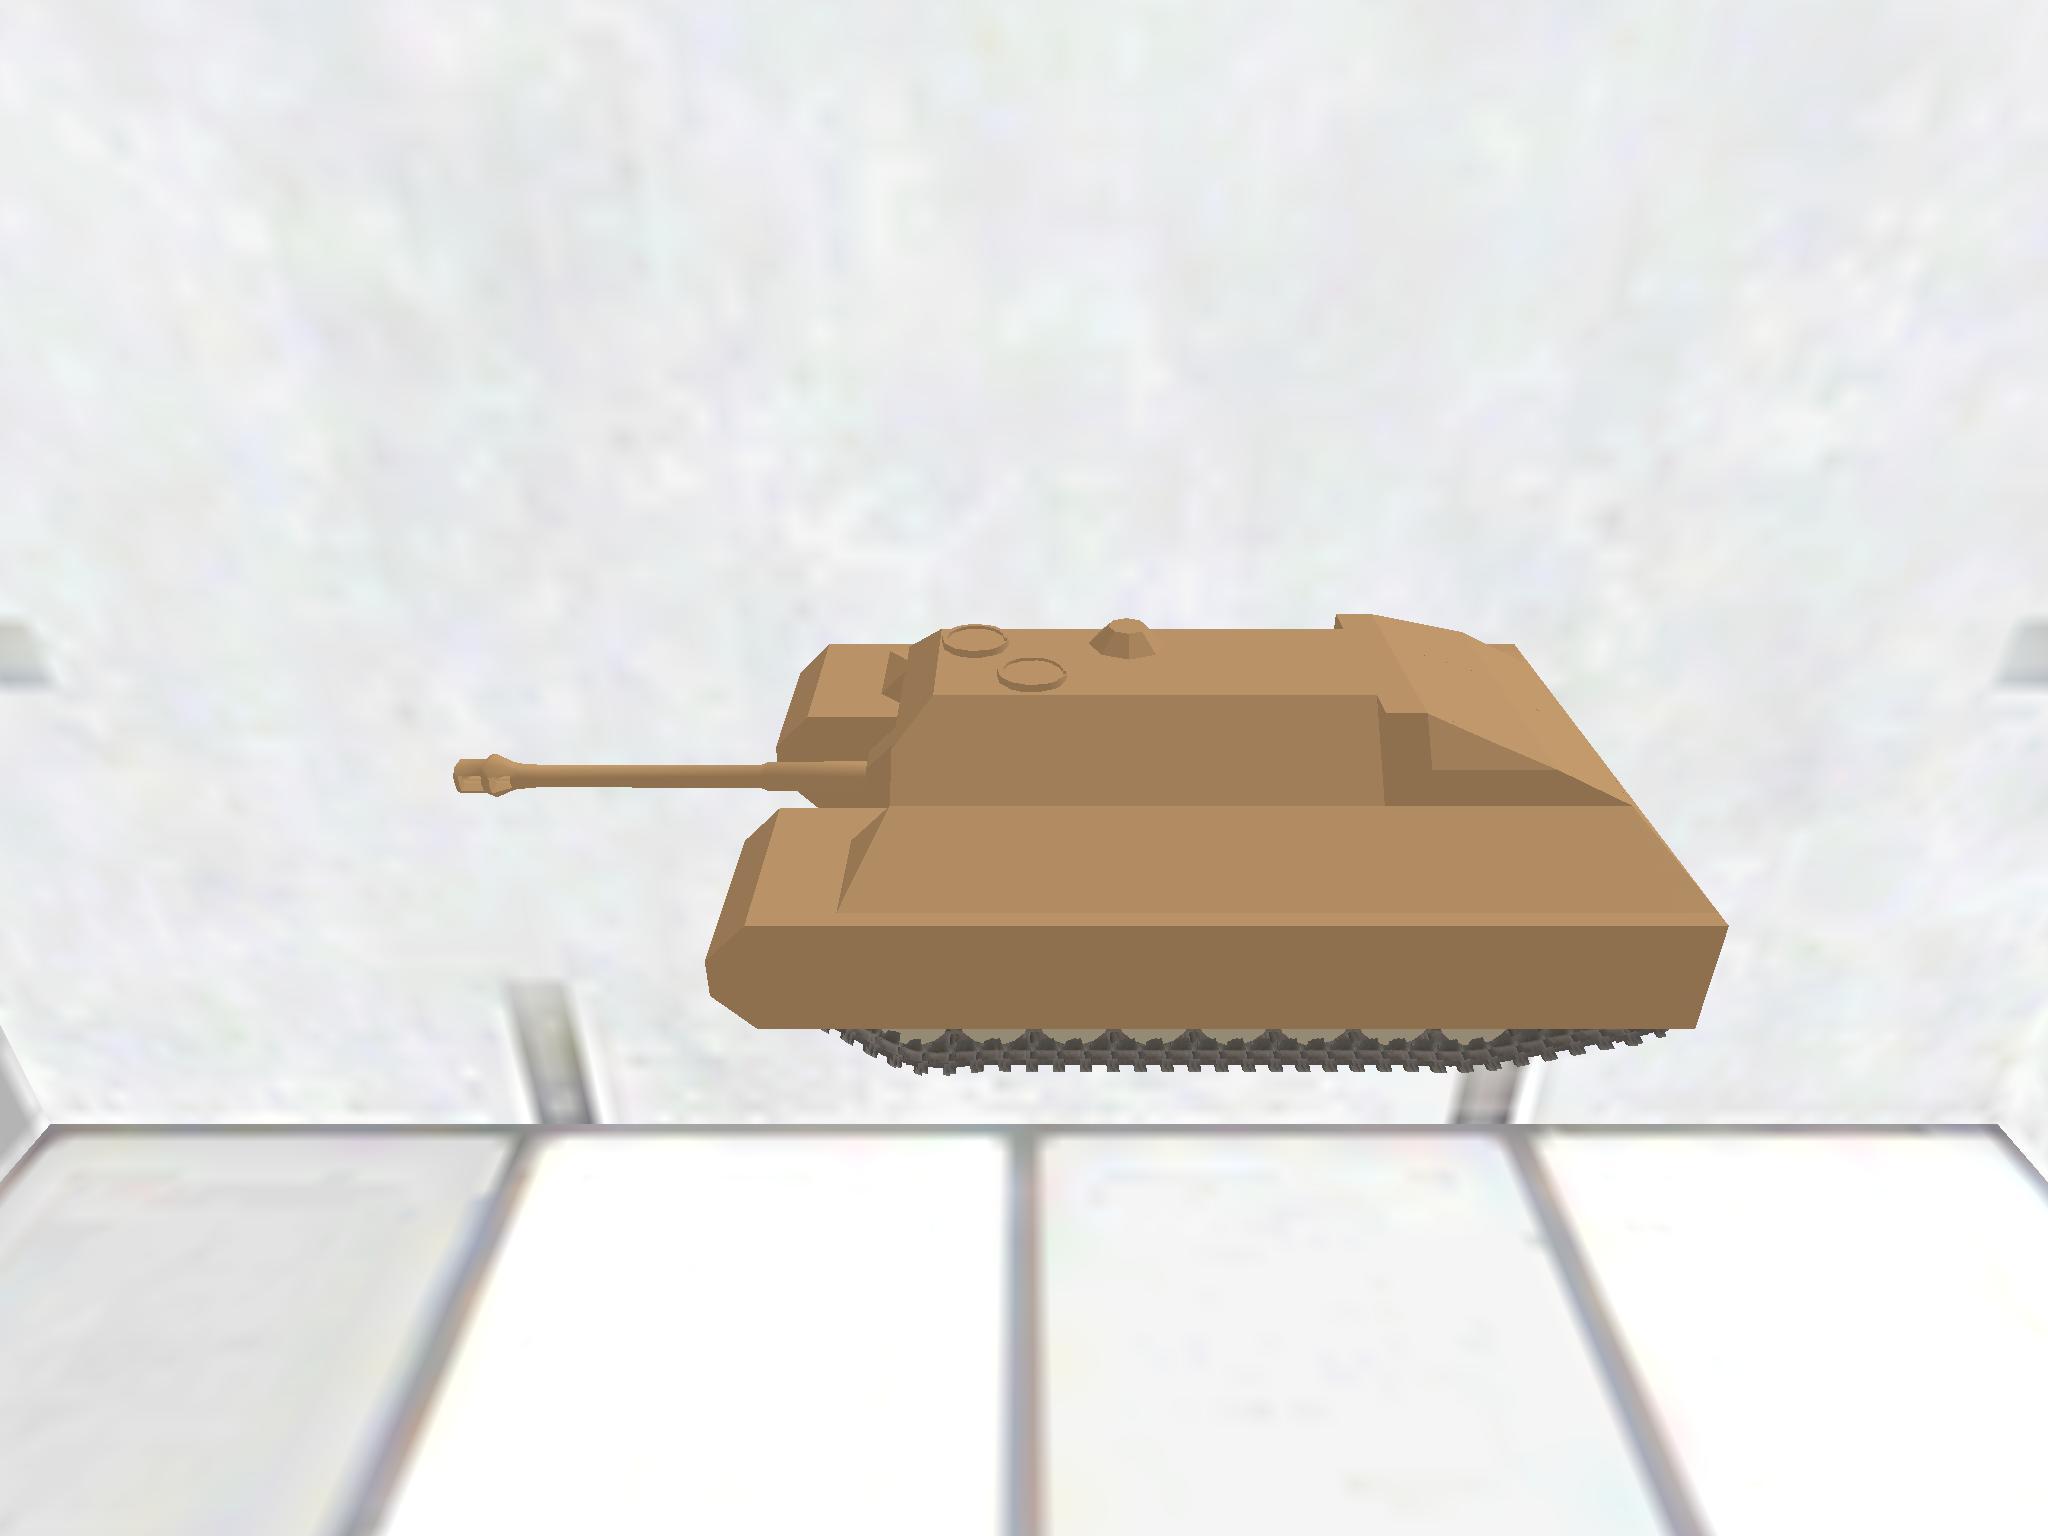 T95 武装付き